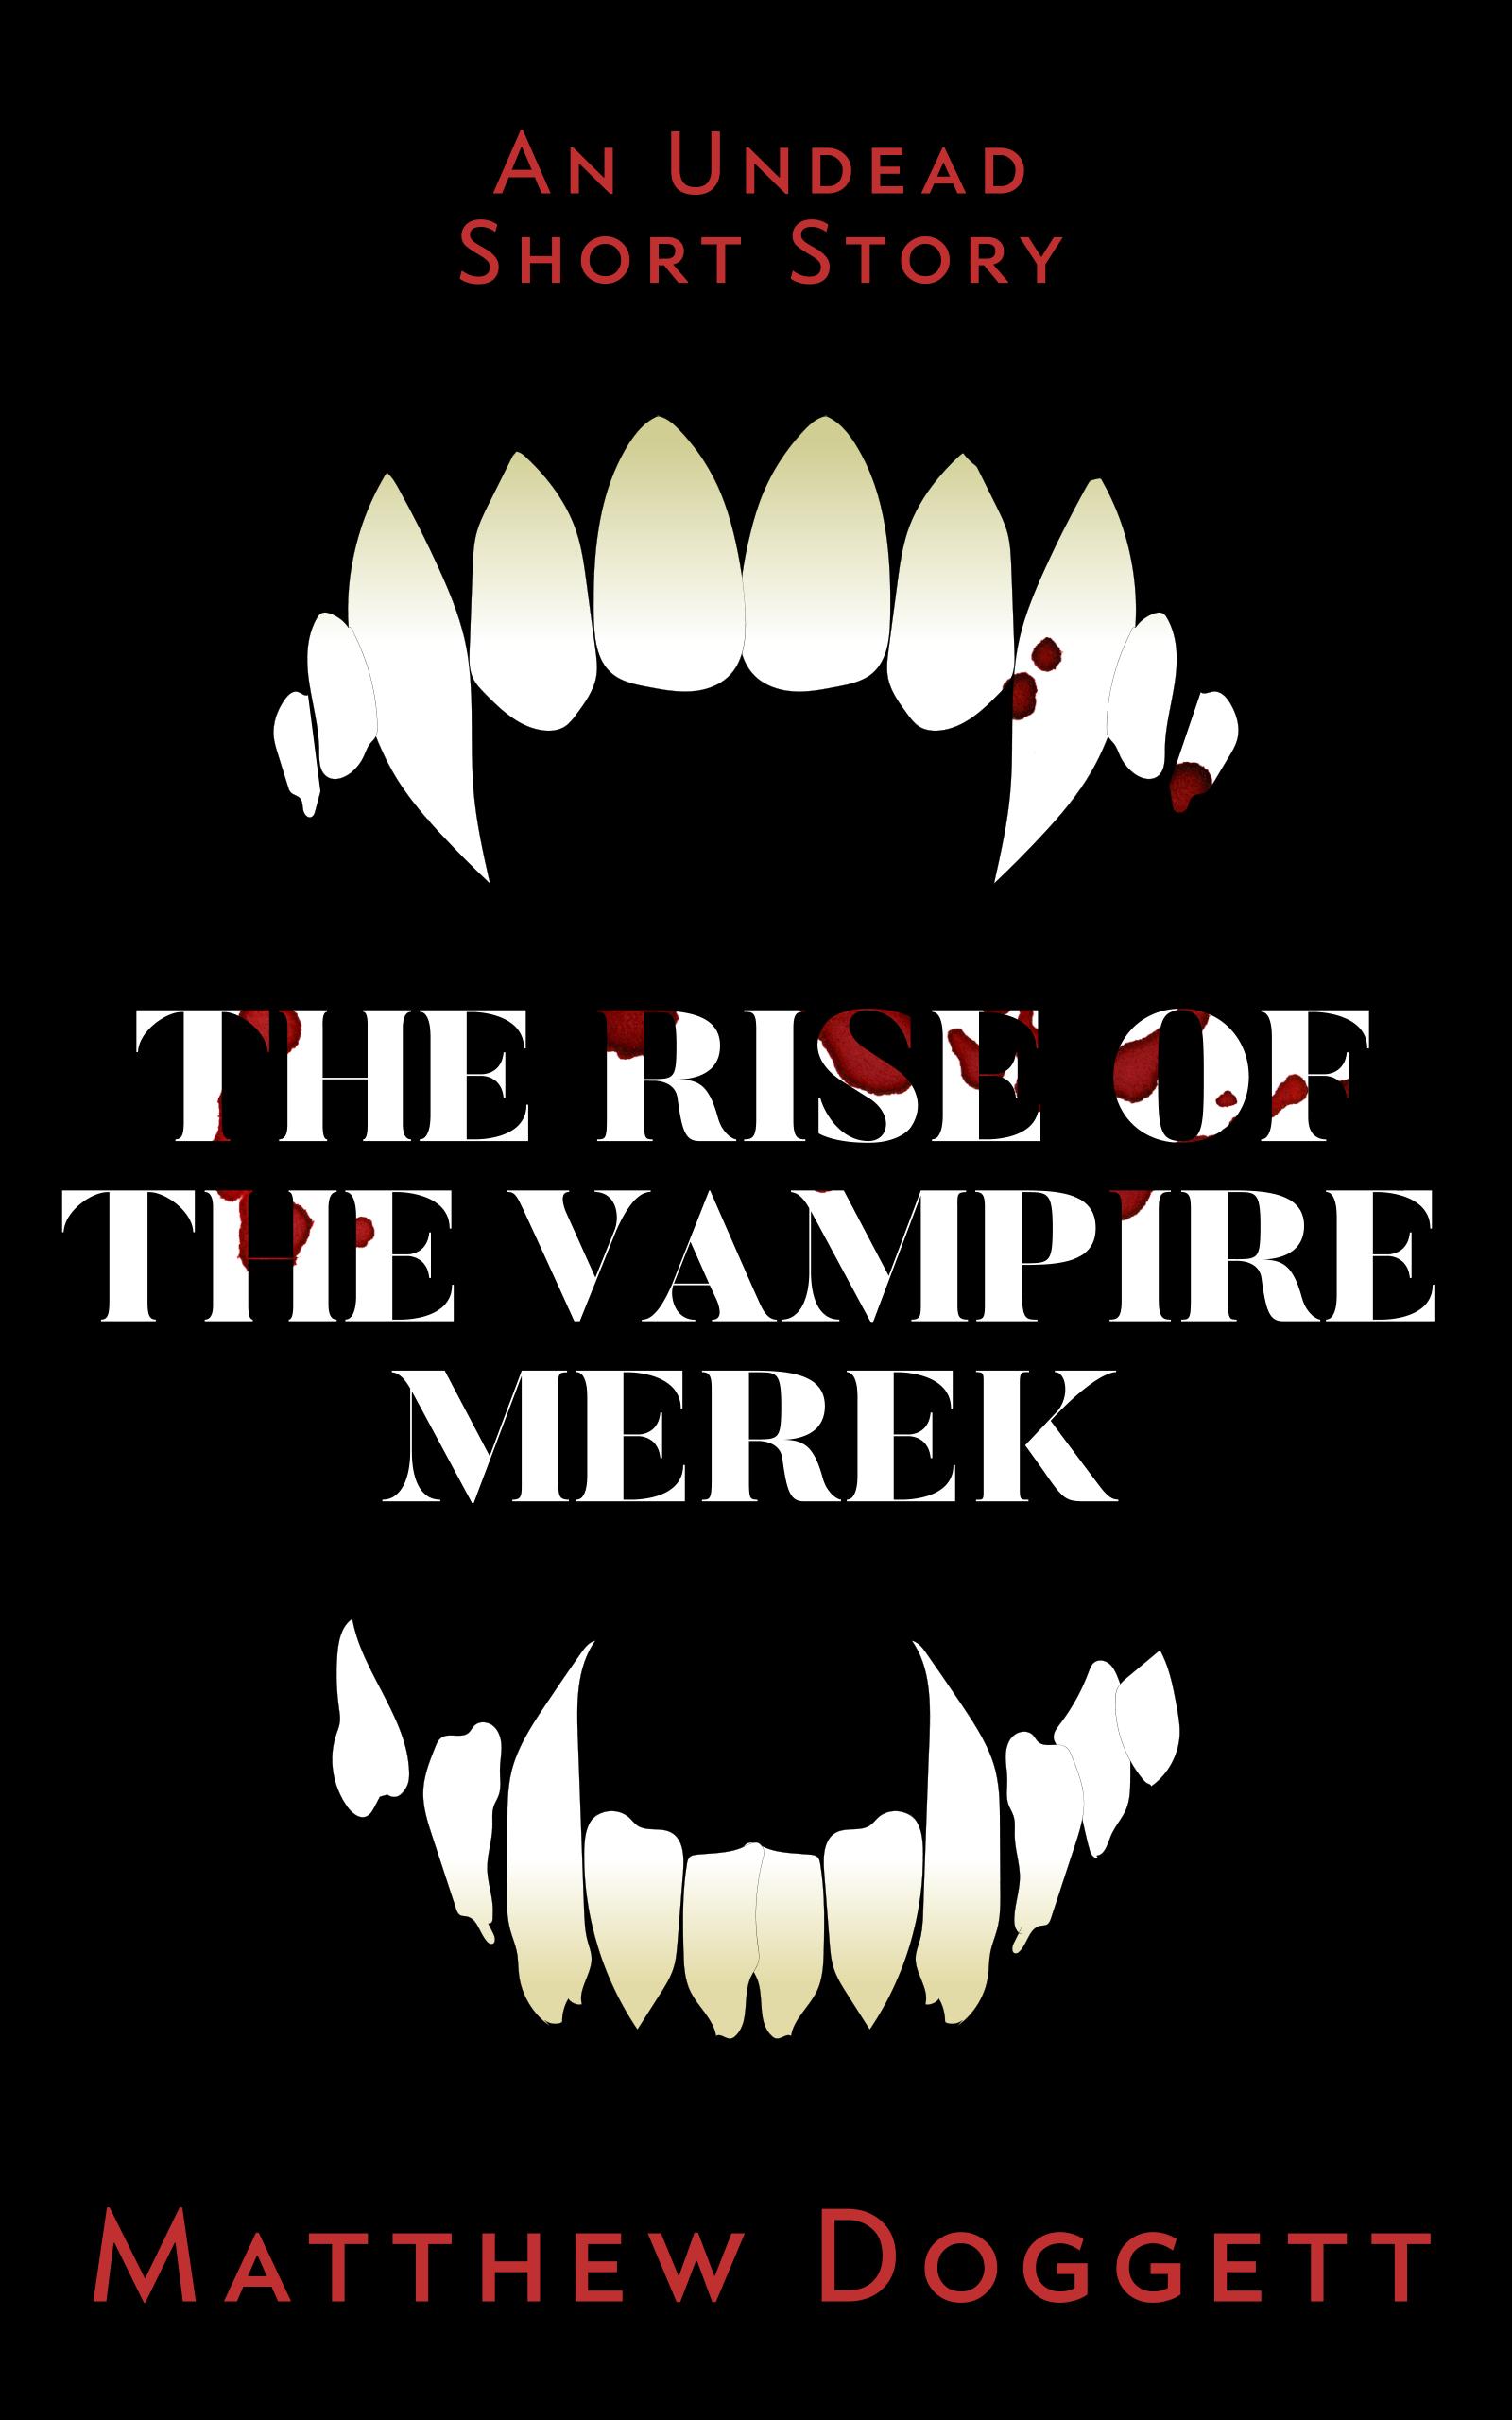 The Rise of the Vampire Merek